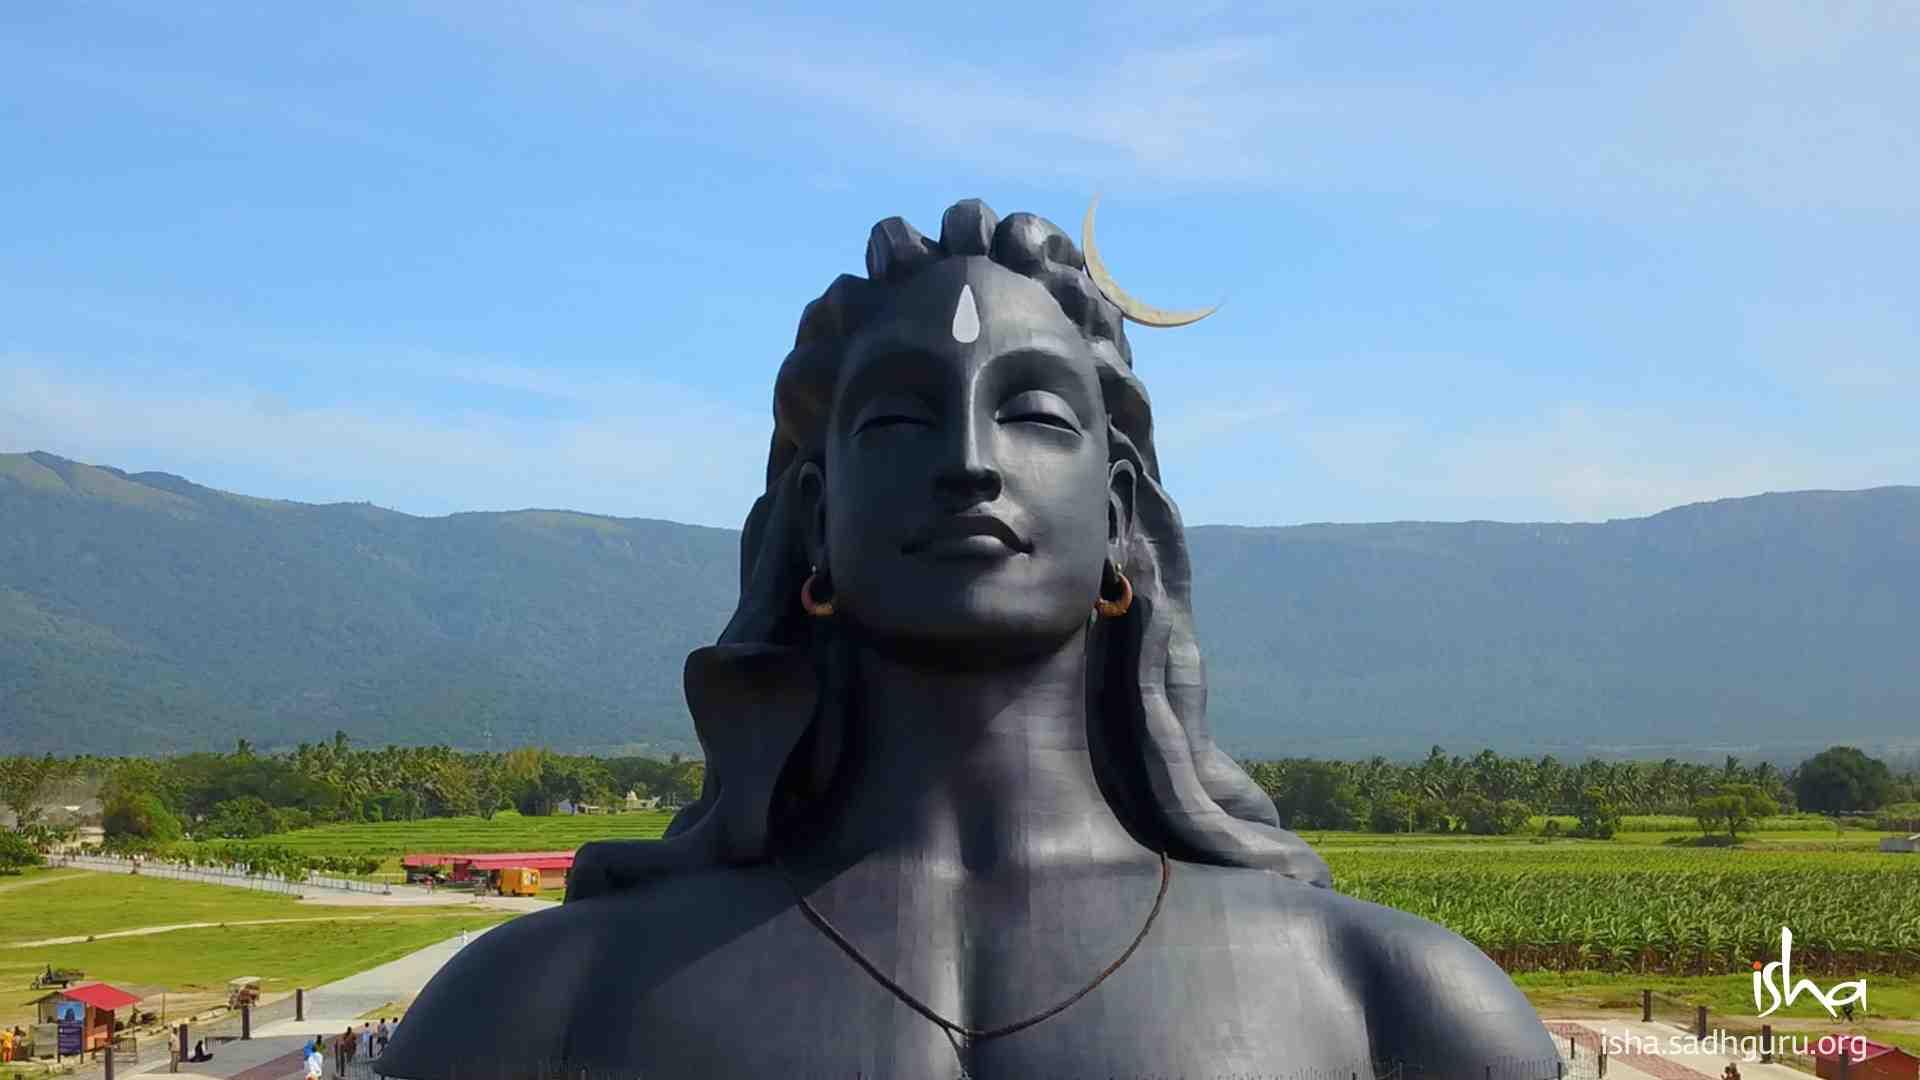 Shiva Wallpaper of 112ft Adiyogi statue version 3